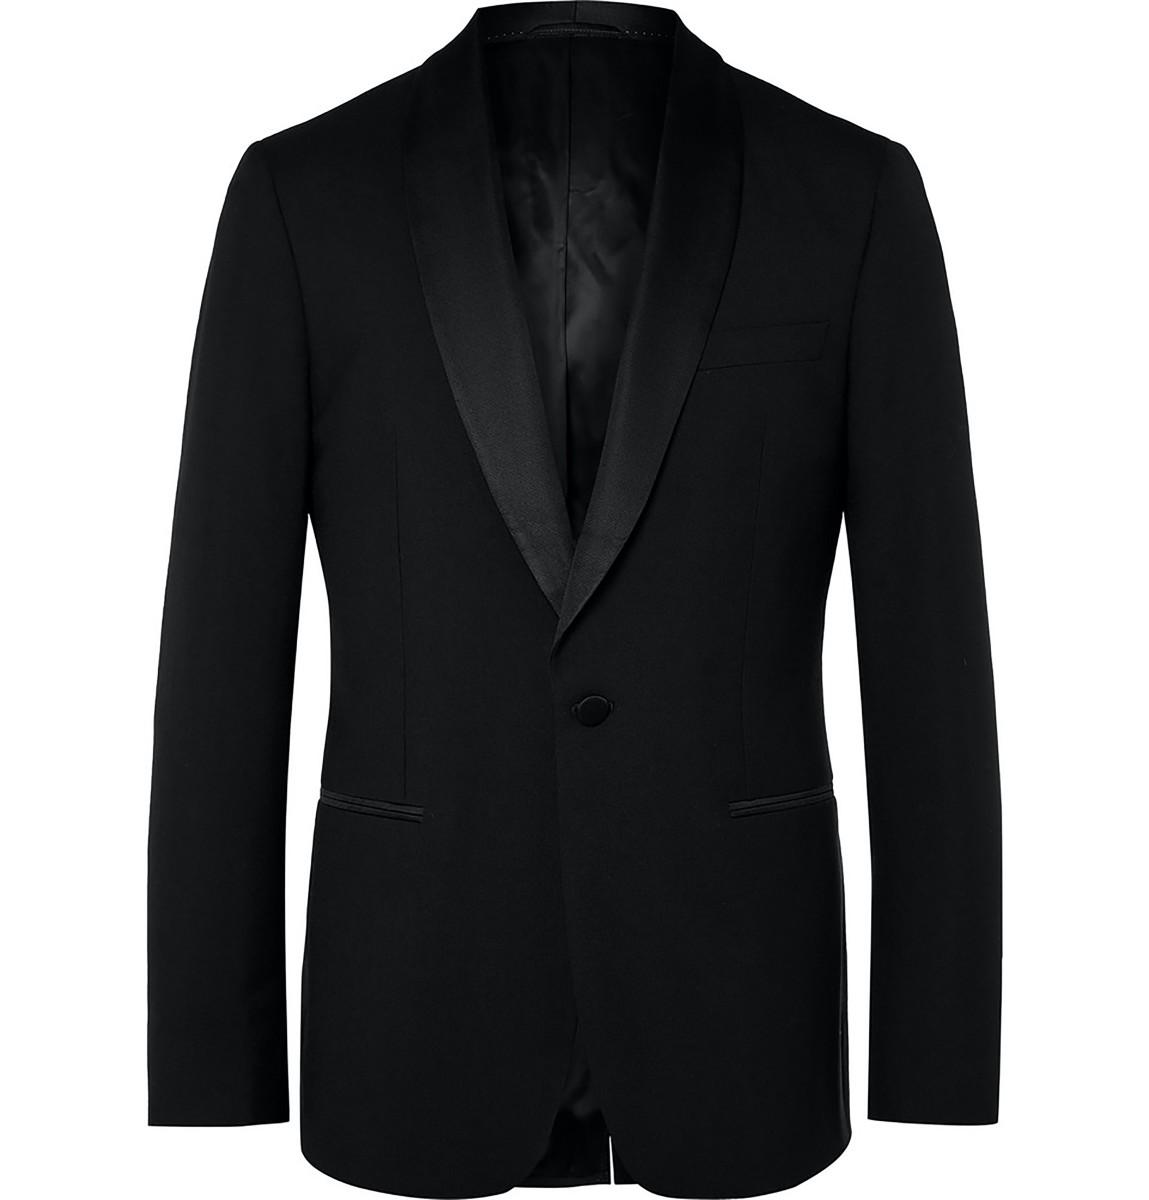 Mr. P. Eveningwear